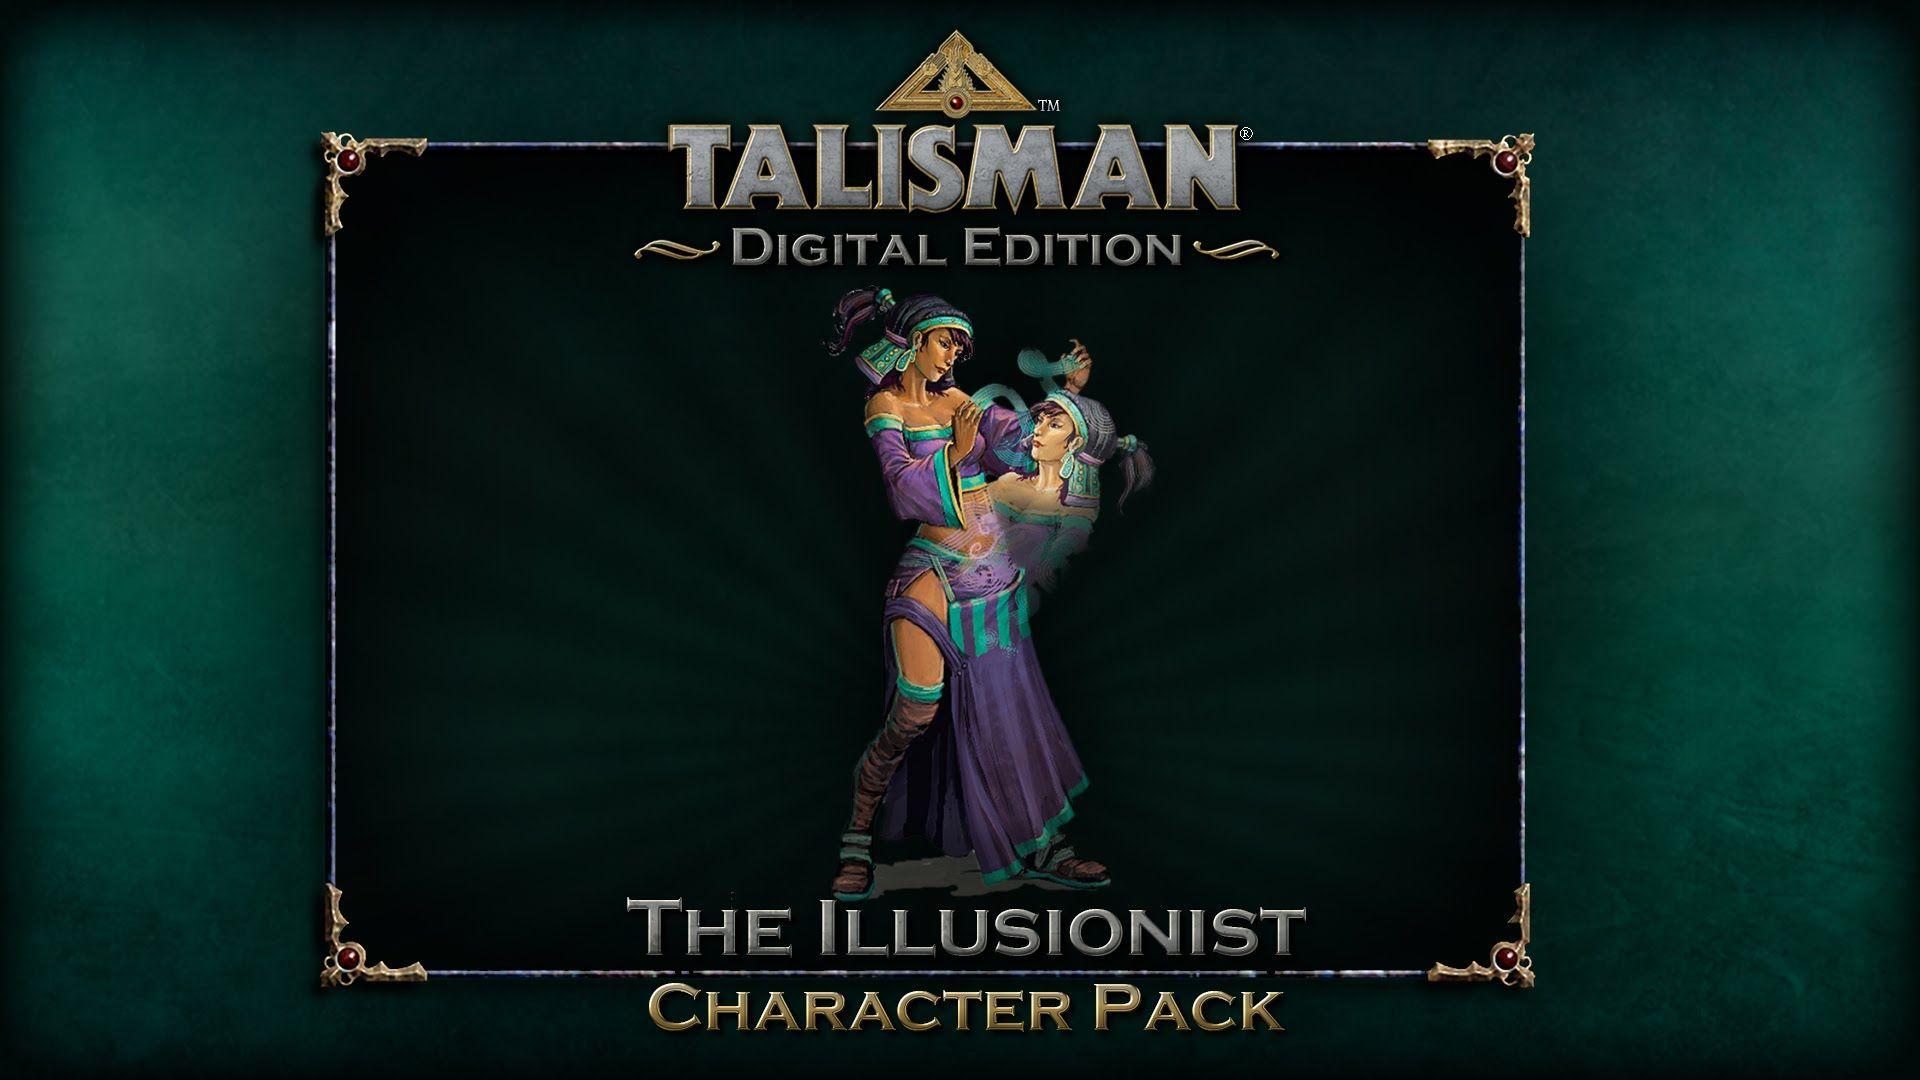 TalismanDEIllusionist The illusionist, Character, Game